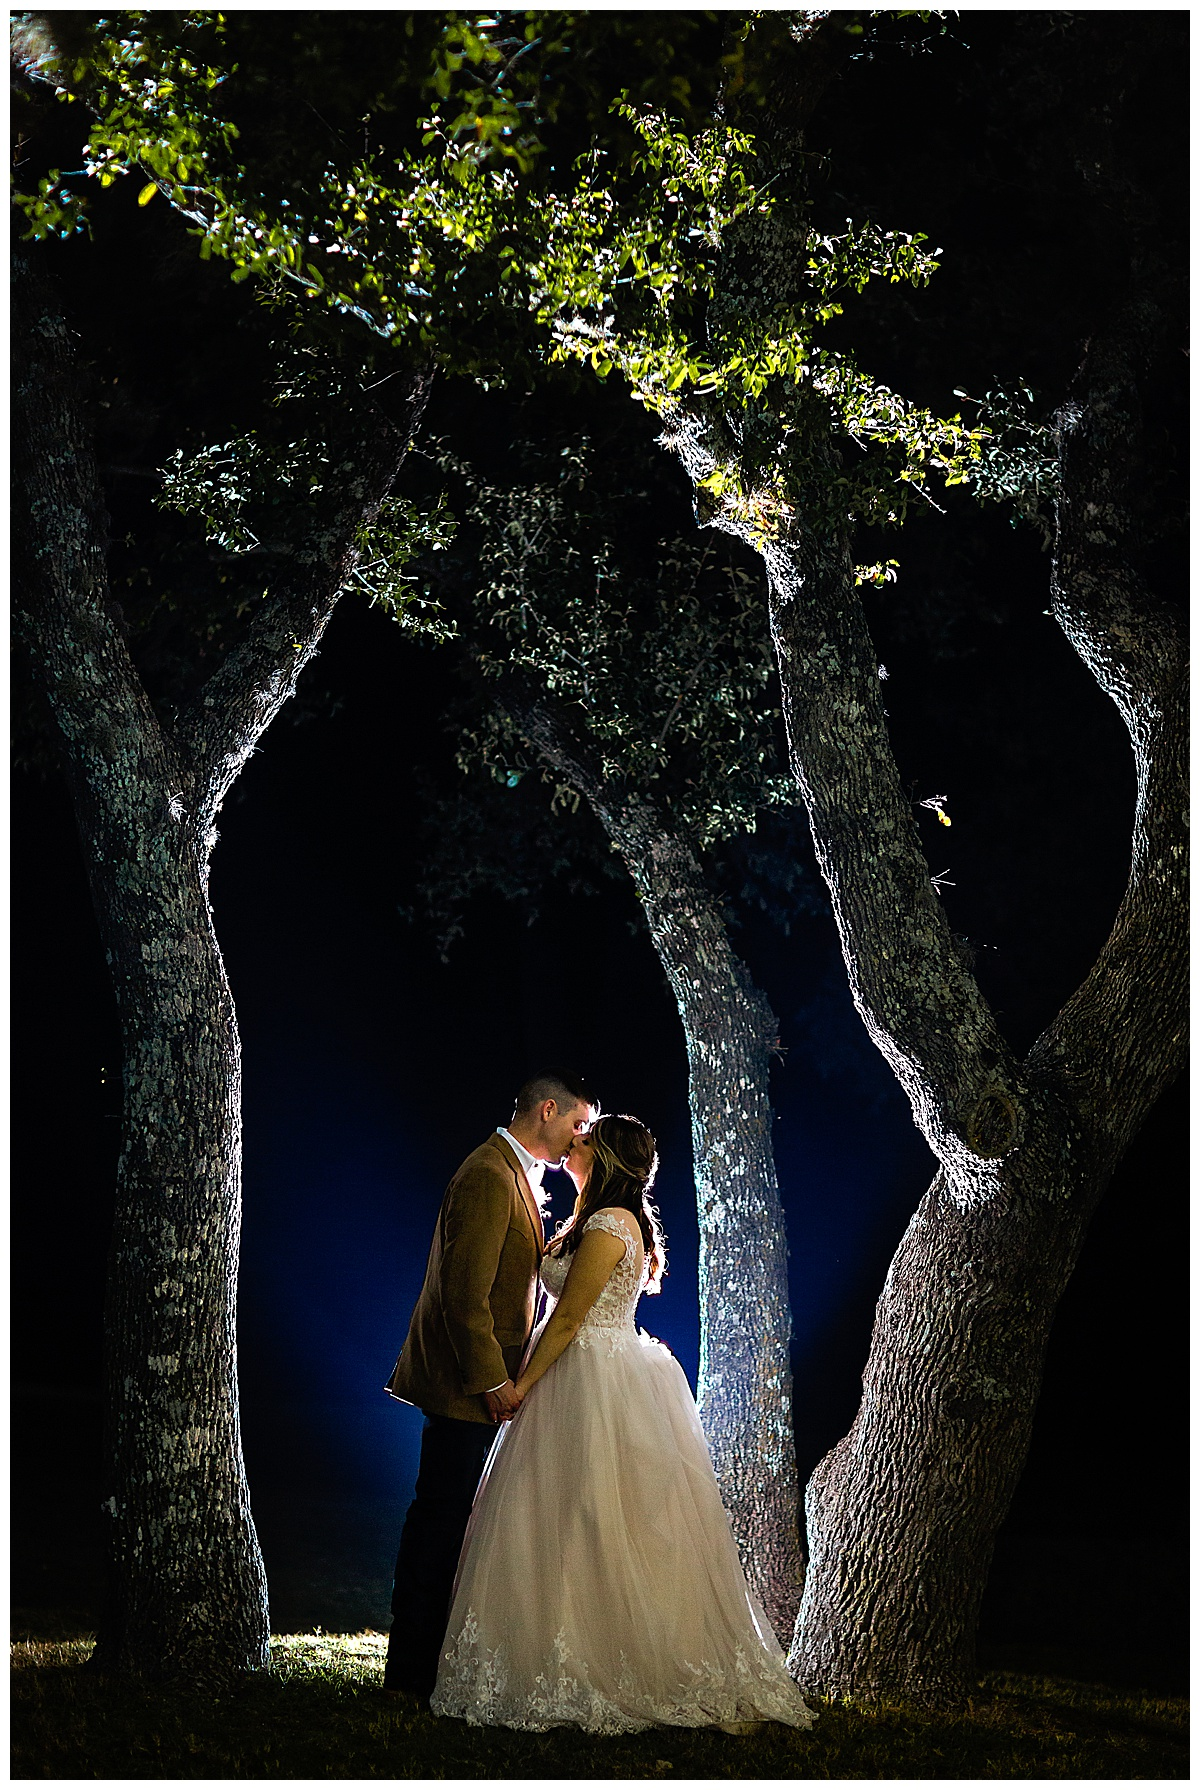 Wedding-Photographer-Texas-Hill-Country-Happy-H-Ranch-Comfor-Texas-Carly-Barton-Photography_0051.jpg